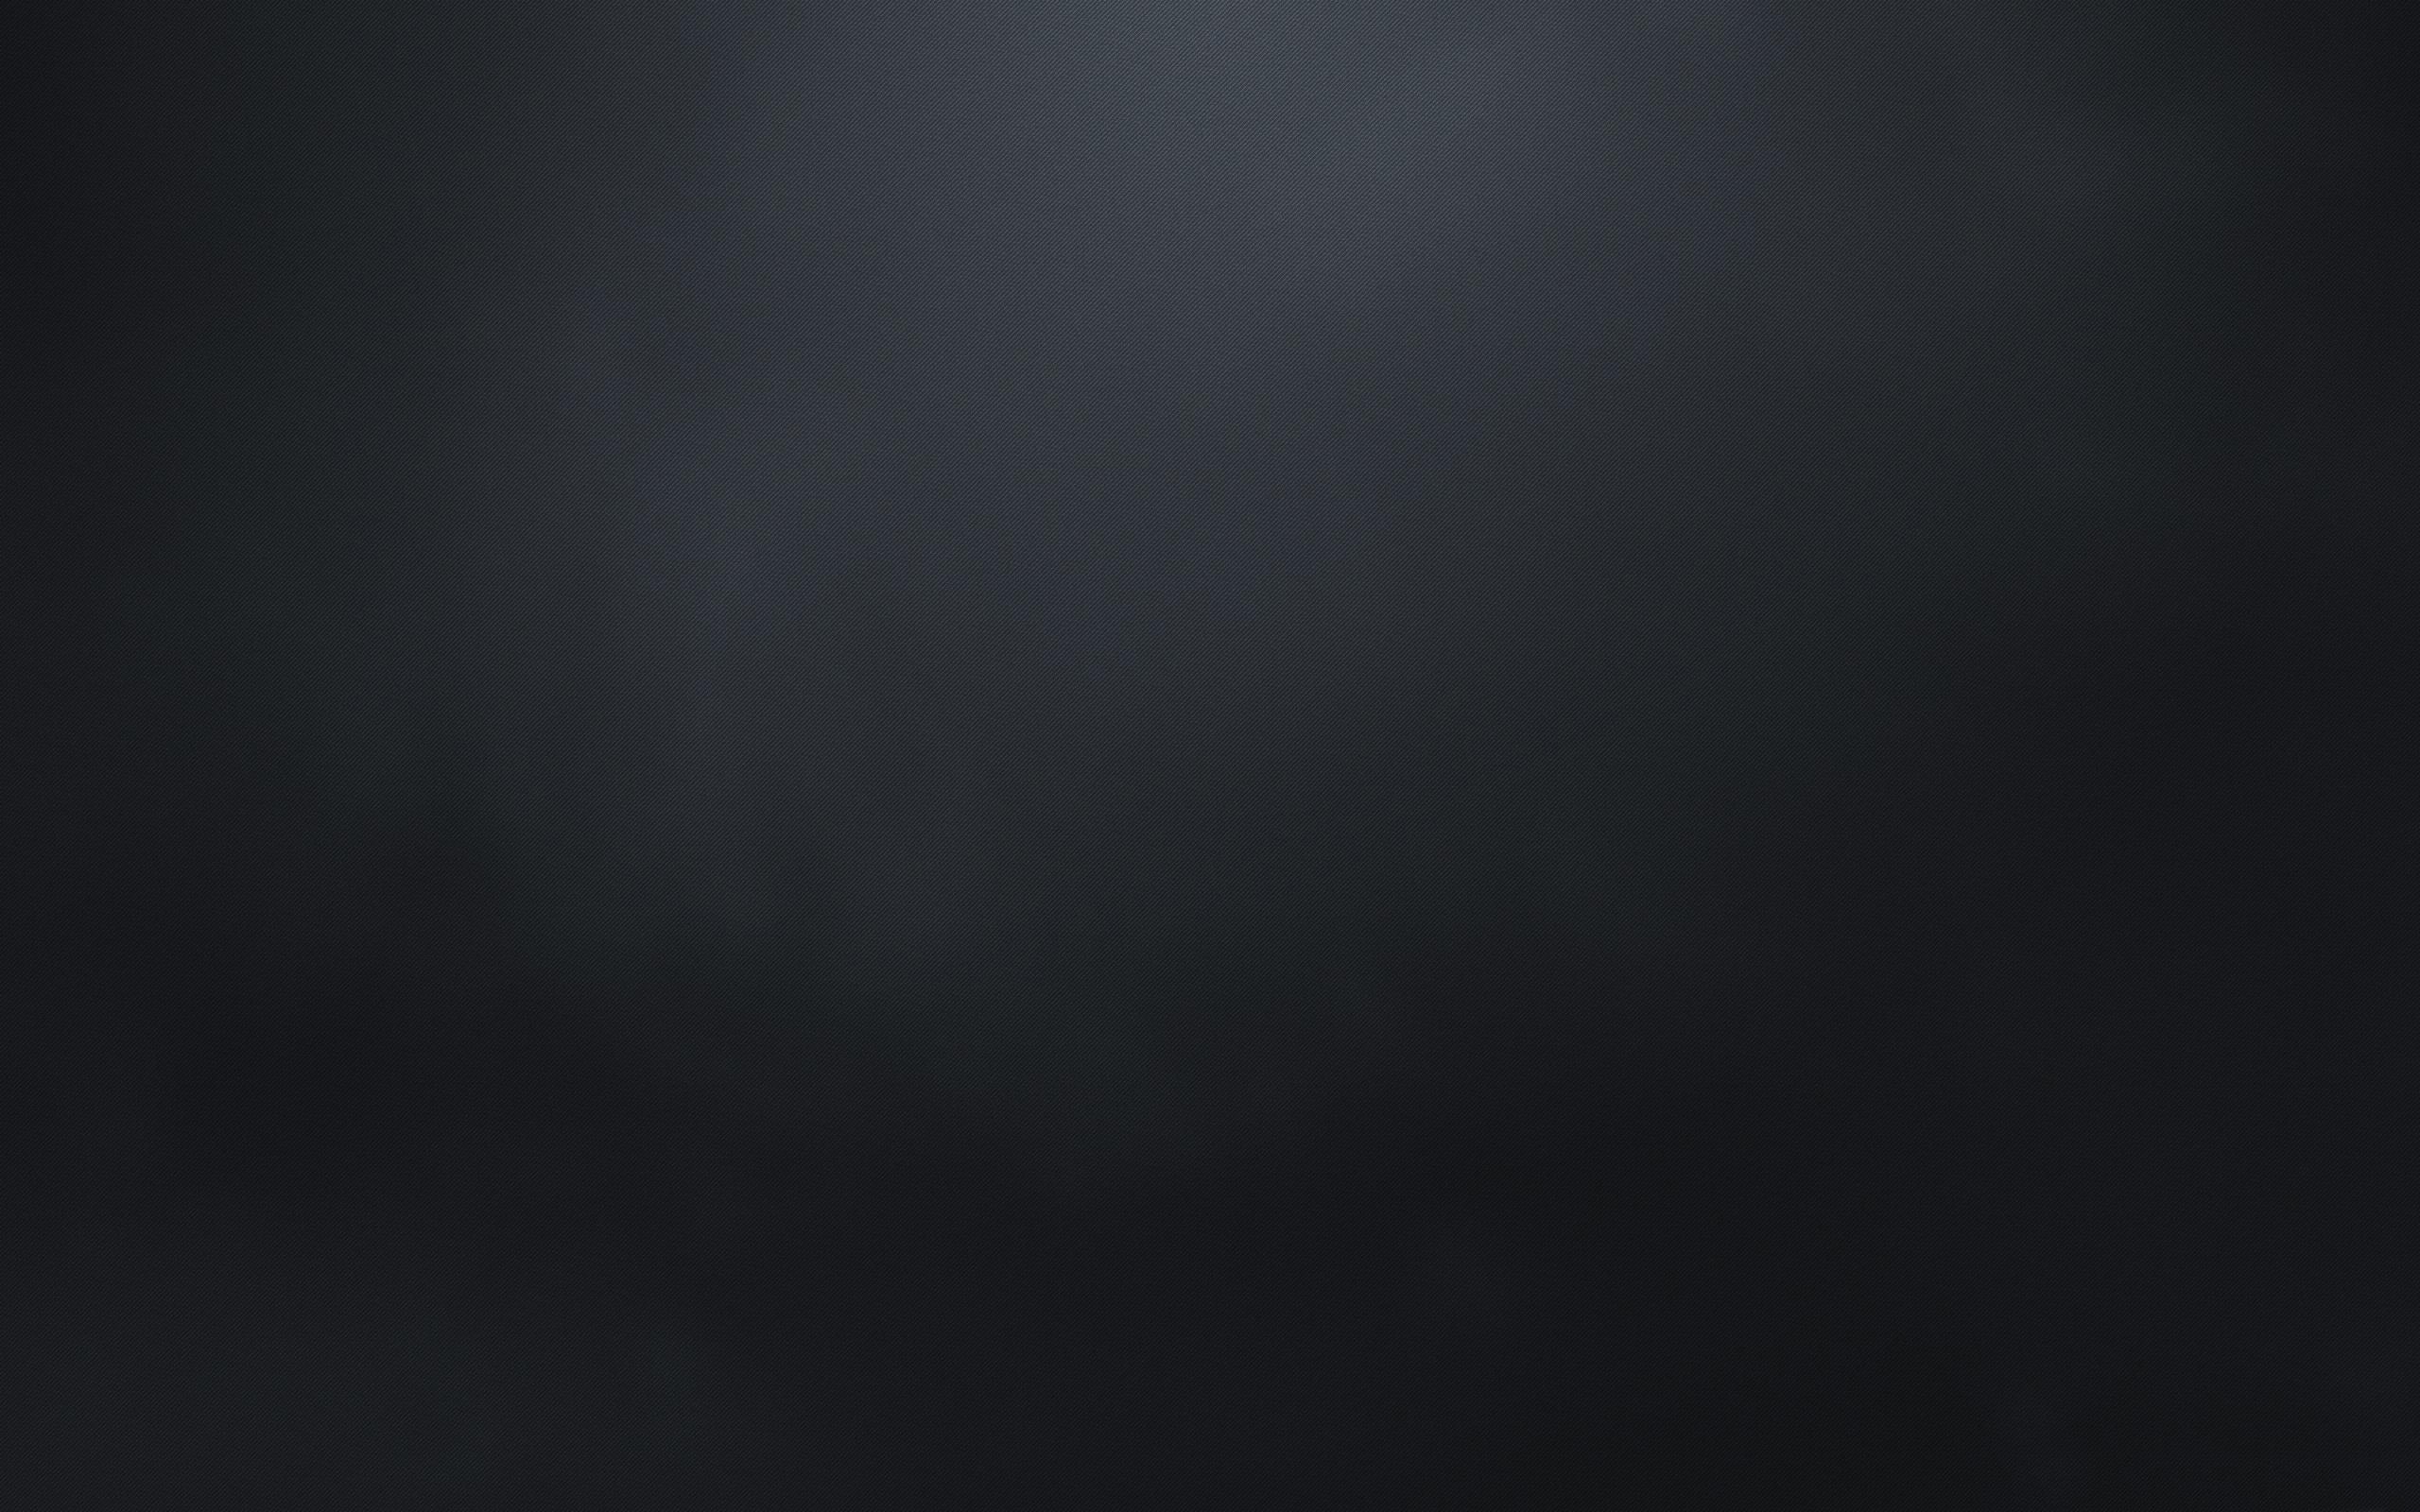 Dark Background Mac Wallpaper Download Allmacwallpaper